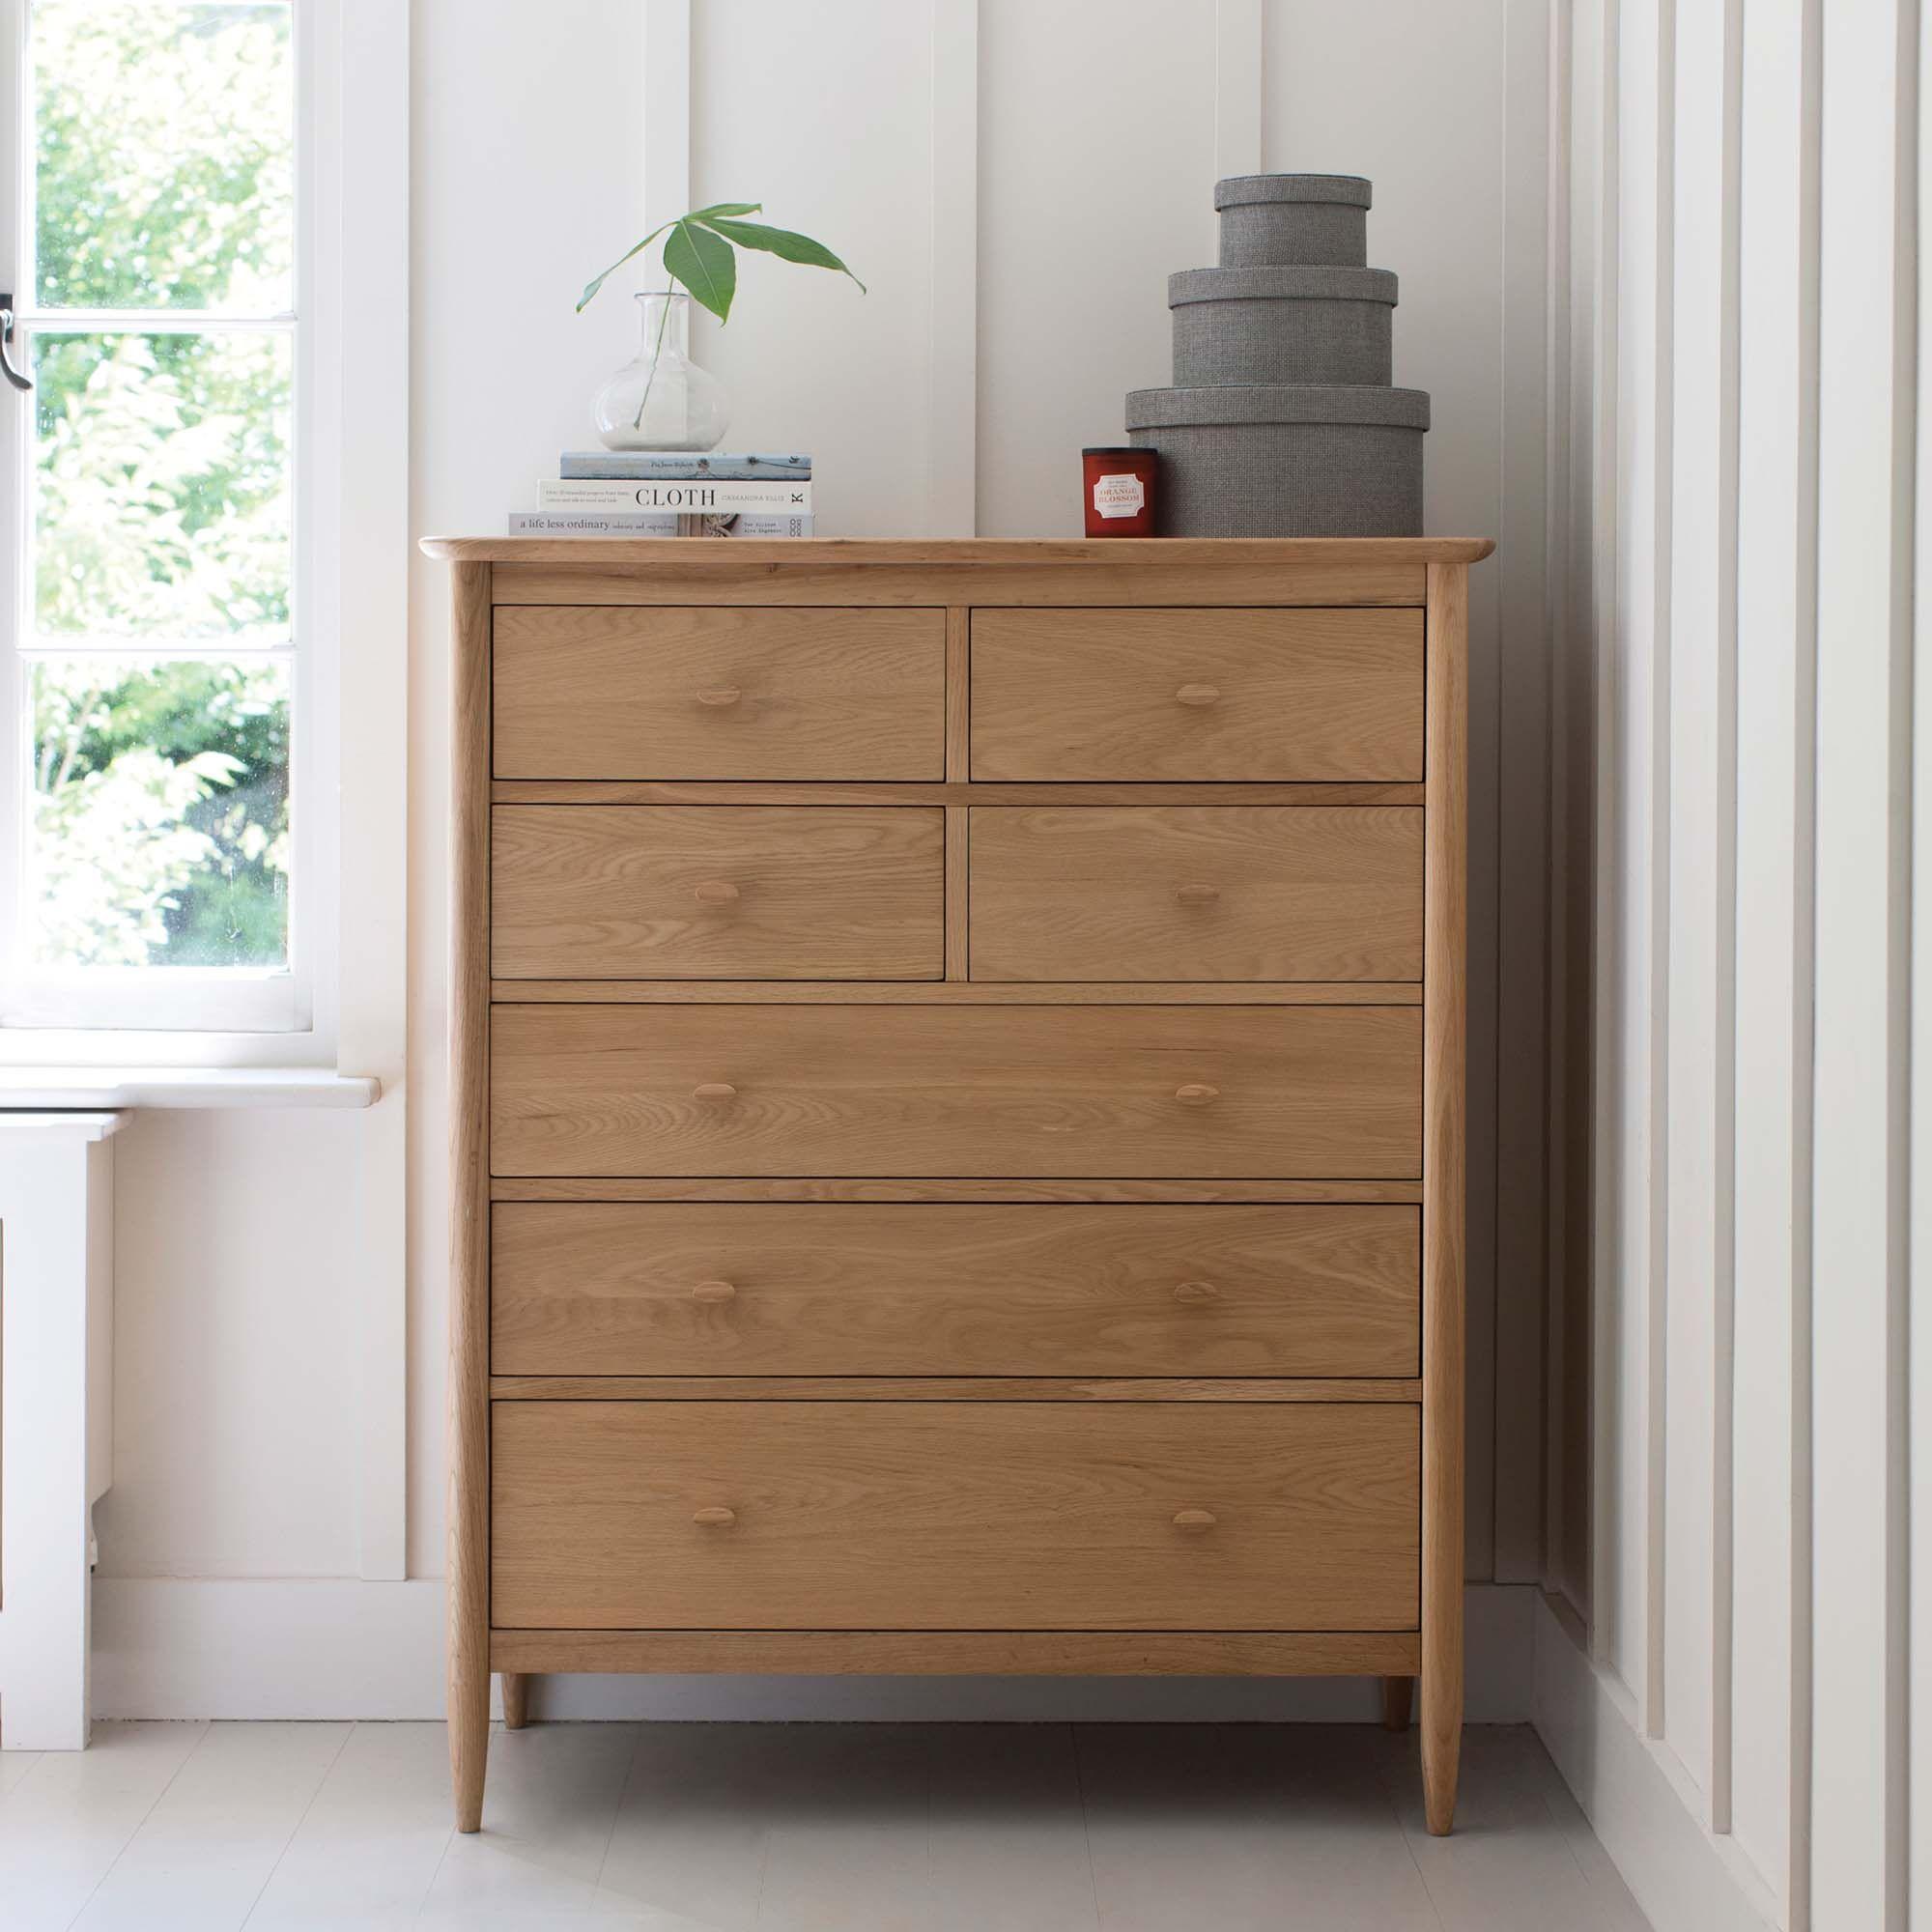 collection kobe tall danish hl honey tk furniture dh tansu dresser net drawer drawers bd bedroom dressers